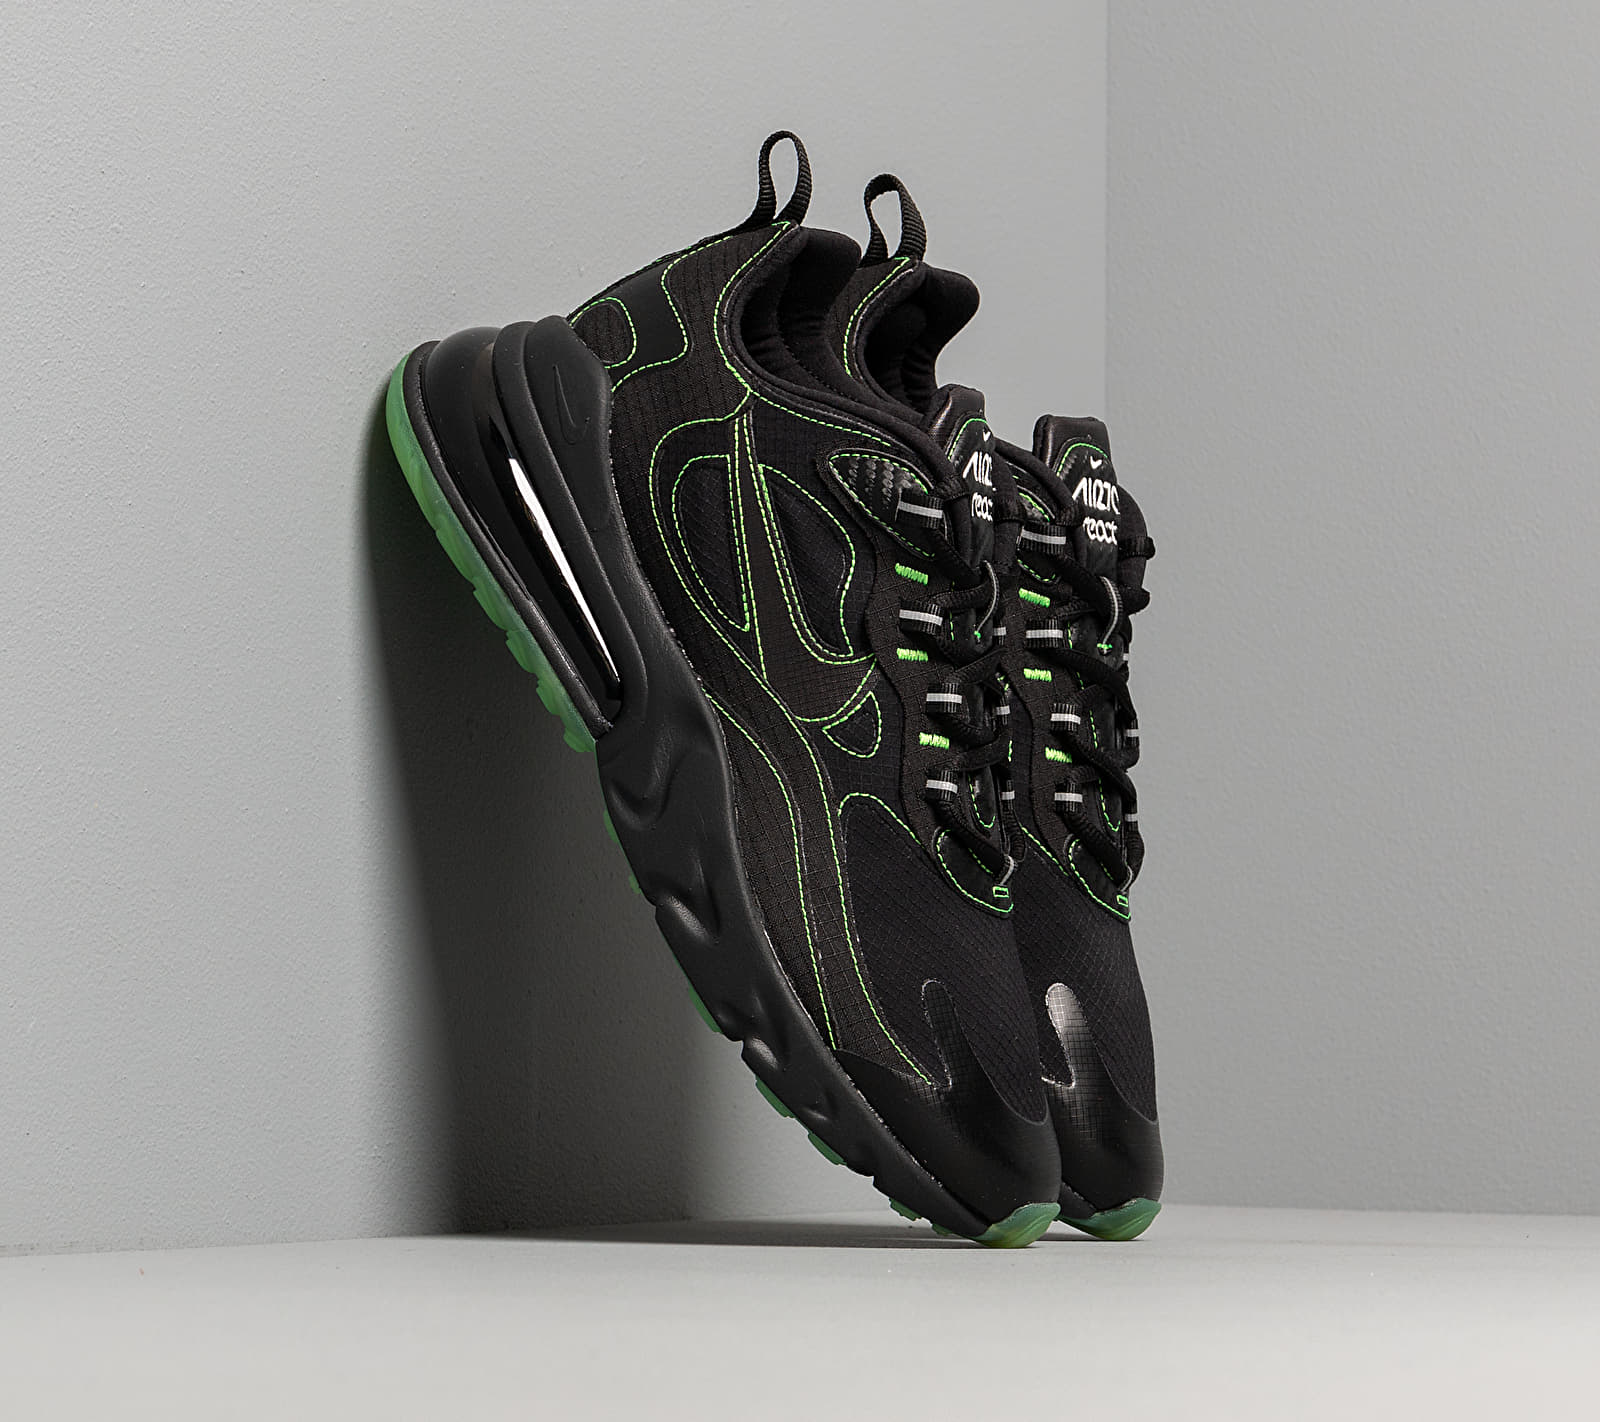 Nike Air Max 270 React Sp Black/ Black-Electric Green CQ6549-001